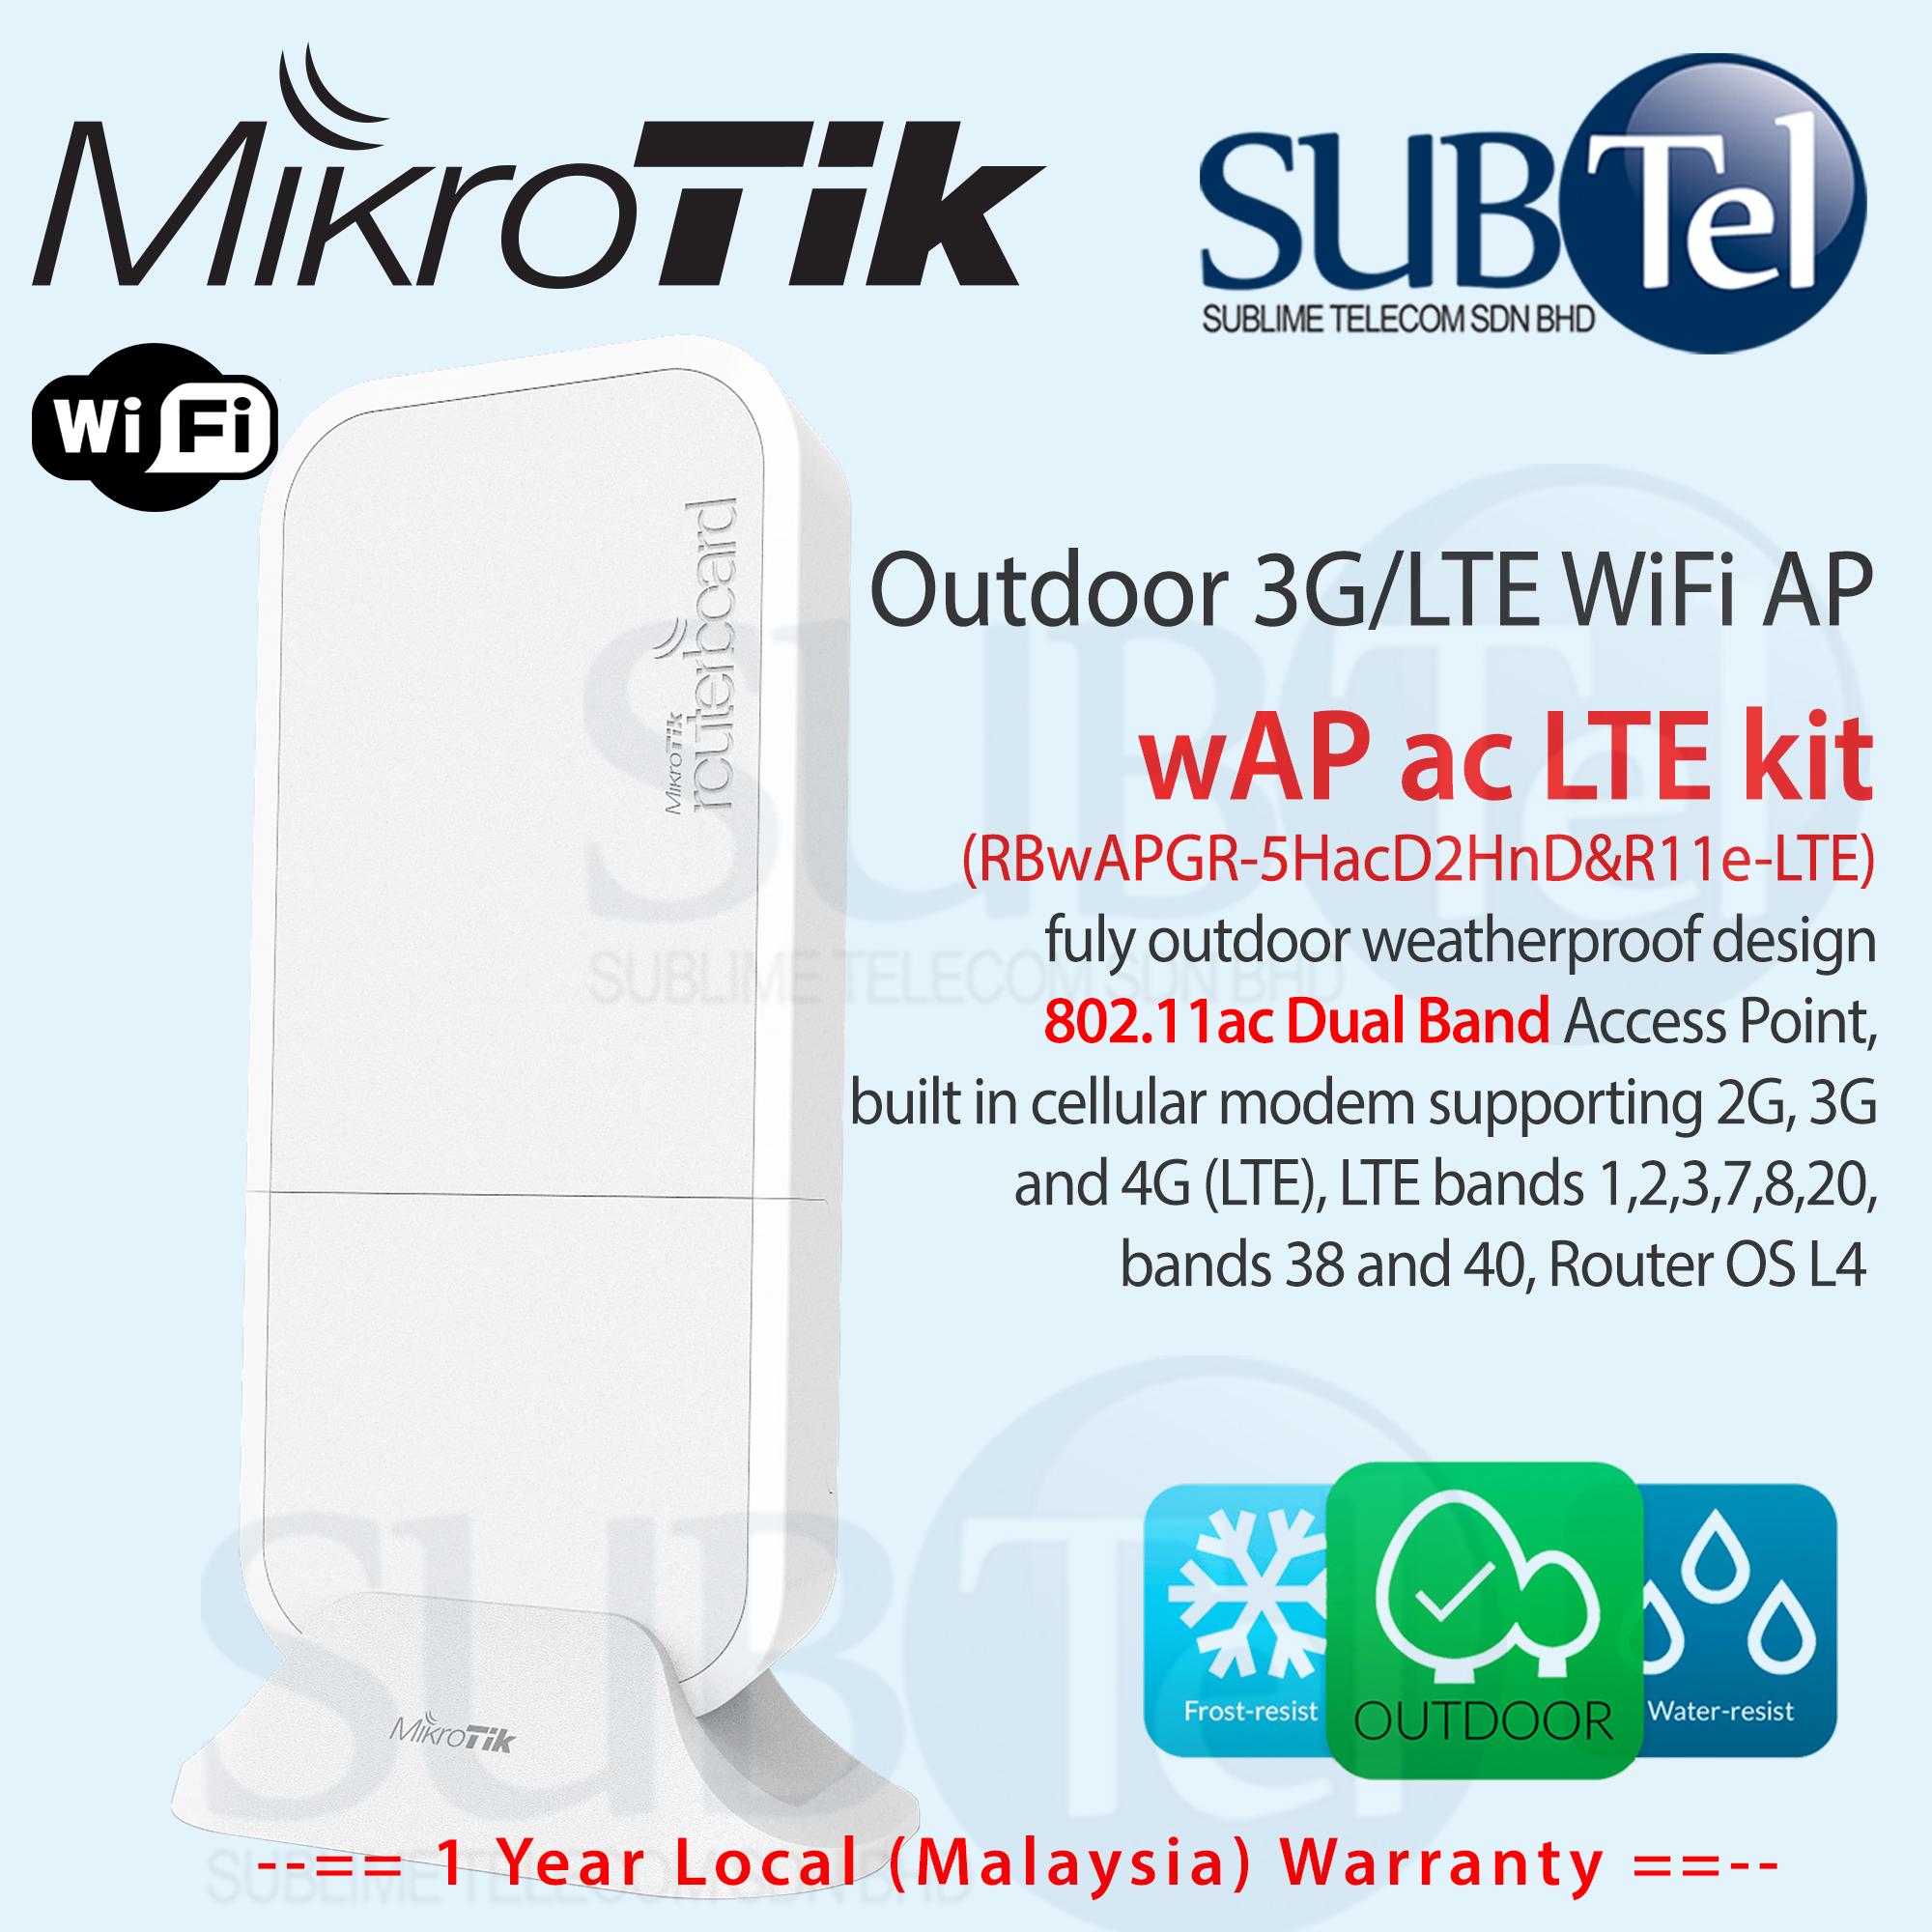 Mikrotik wAP ac LTE Outdoor 2G 3G 4G Router Modem & WiFi AP Malaysia